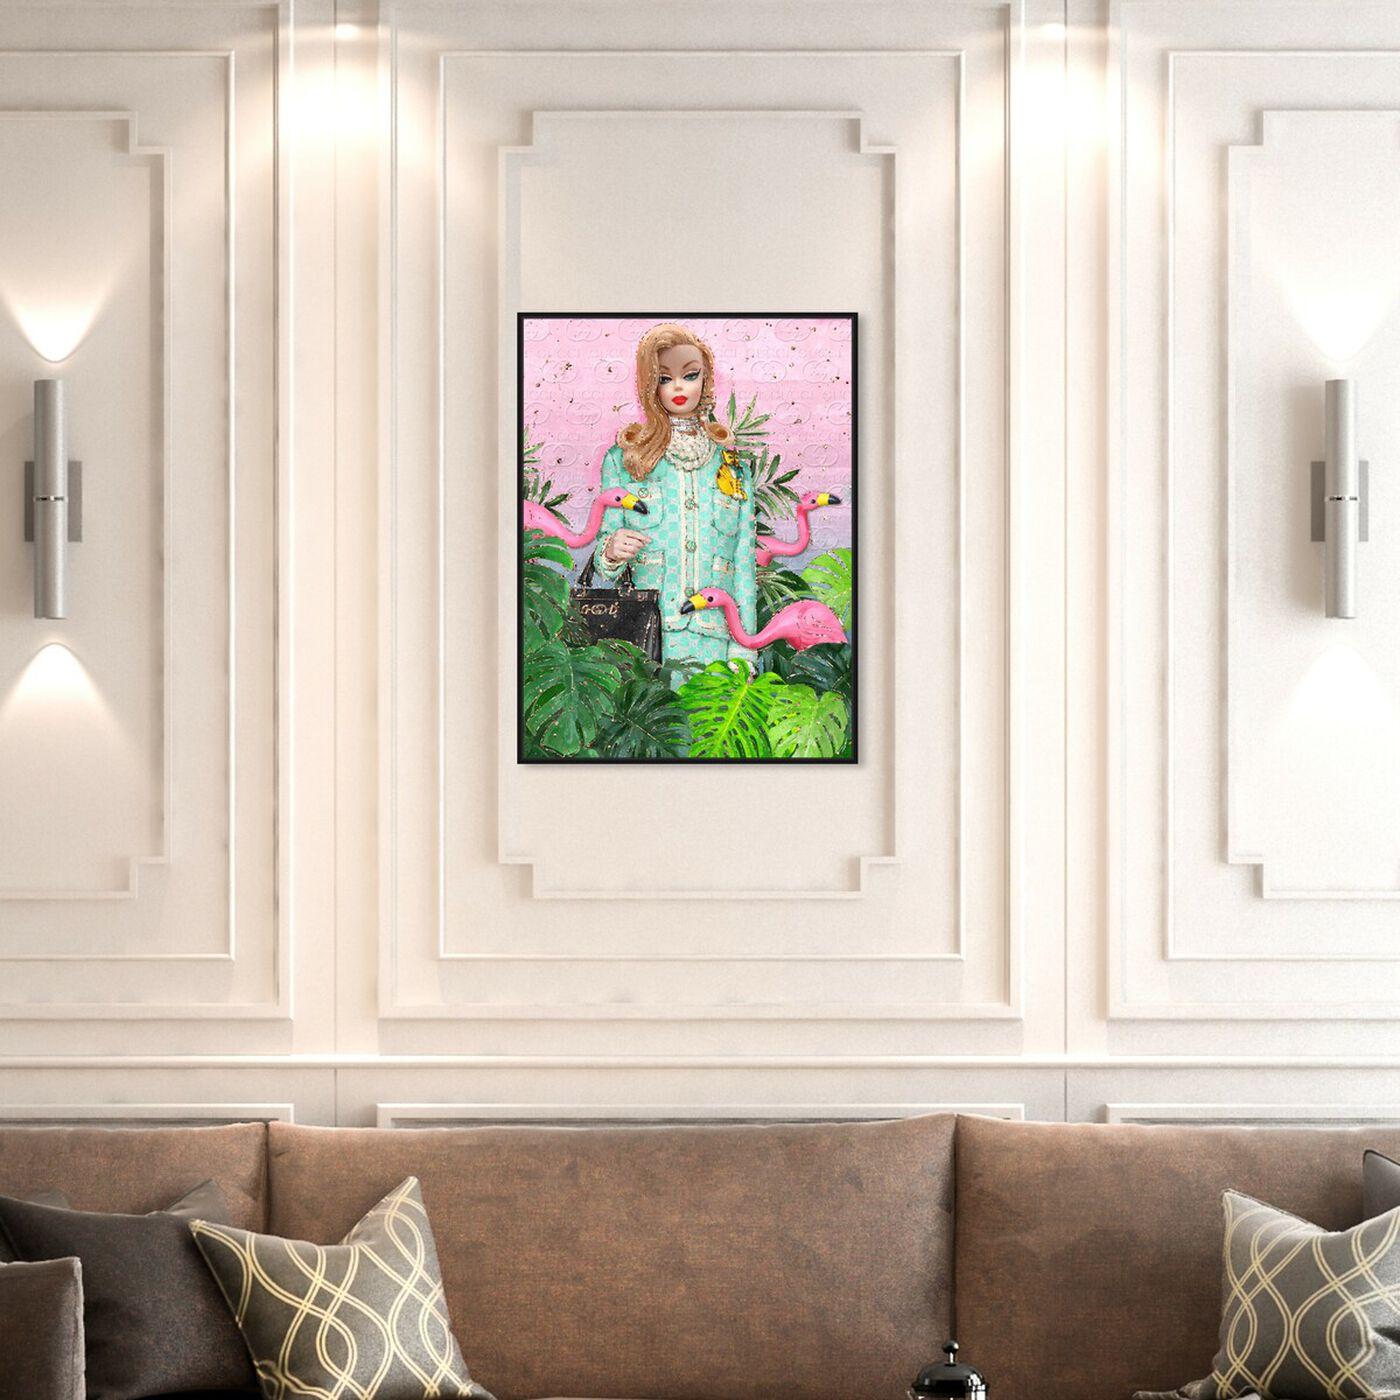 Hanging view of Take A Trip art.